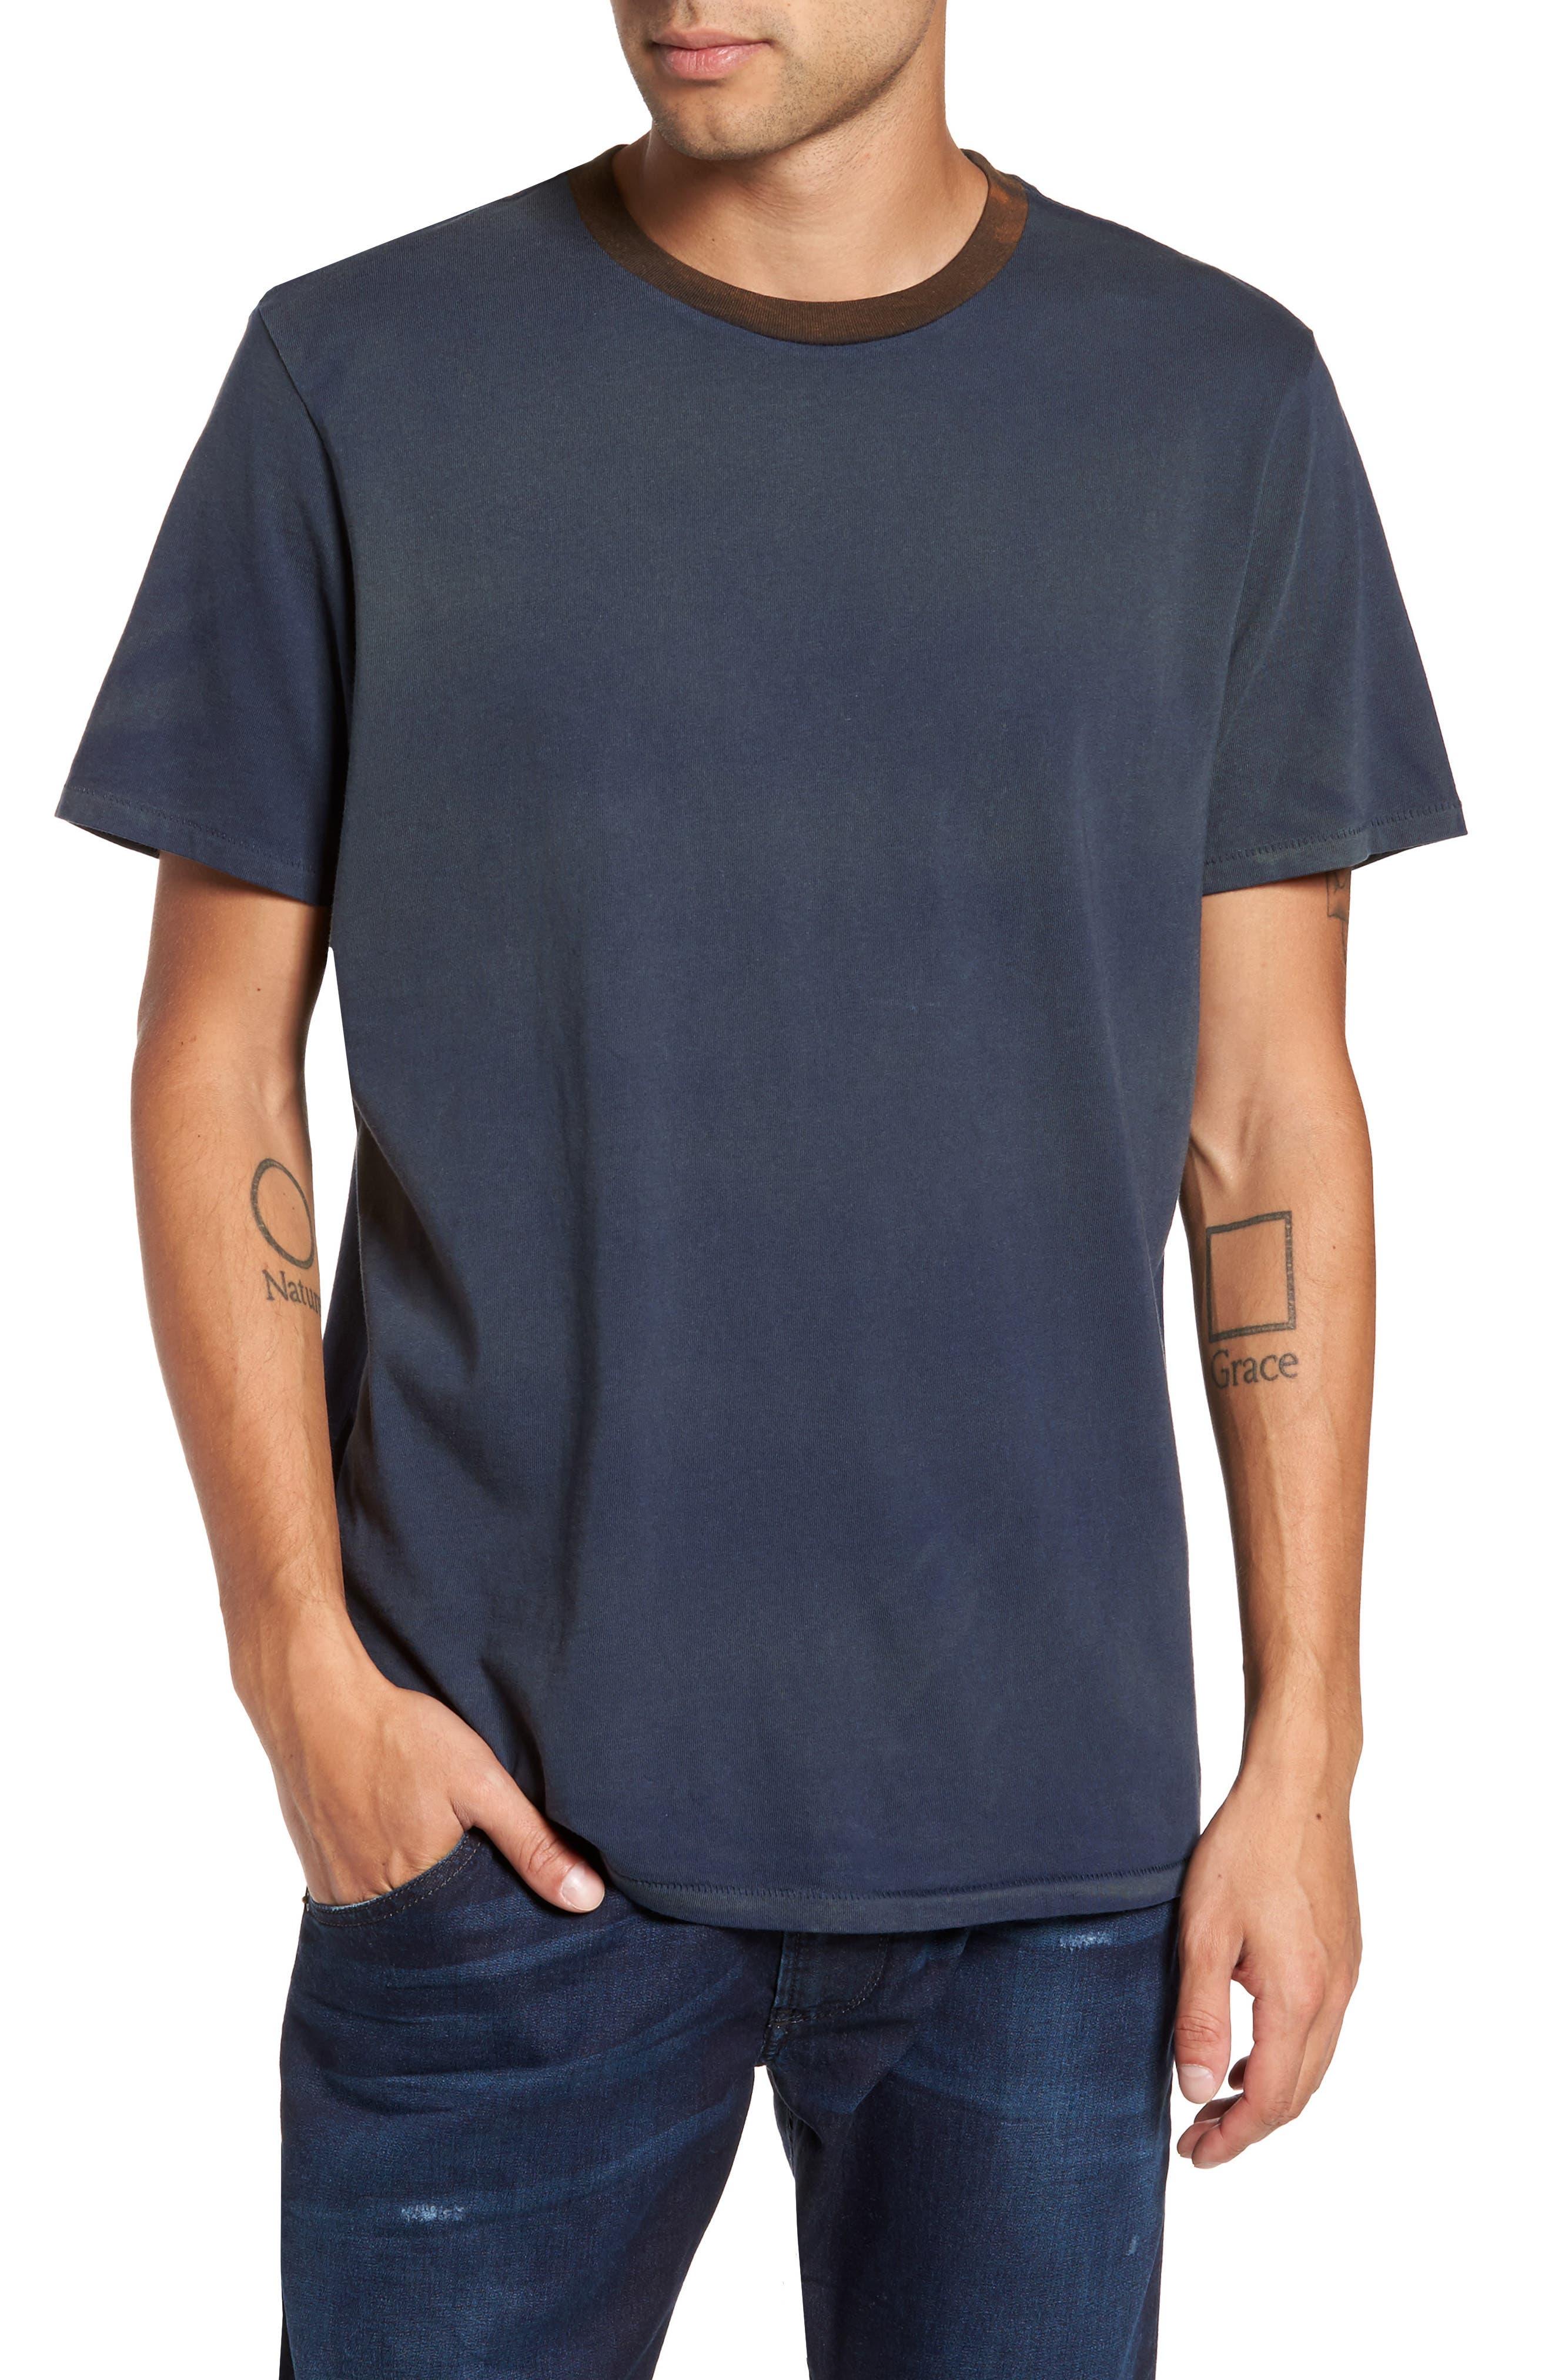 Main Image - The Rail Two-Tone T-Shirt